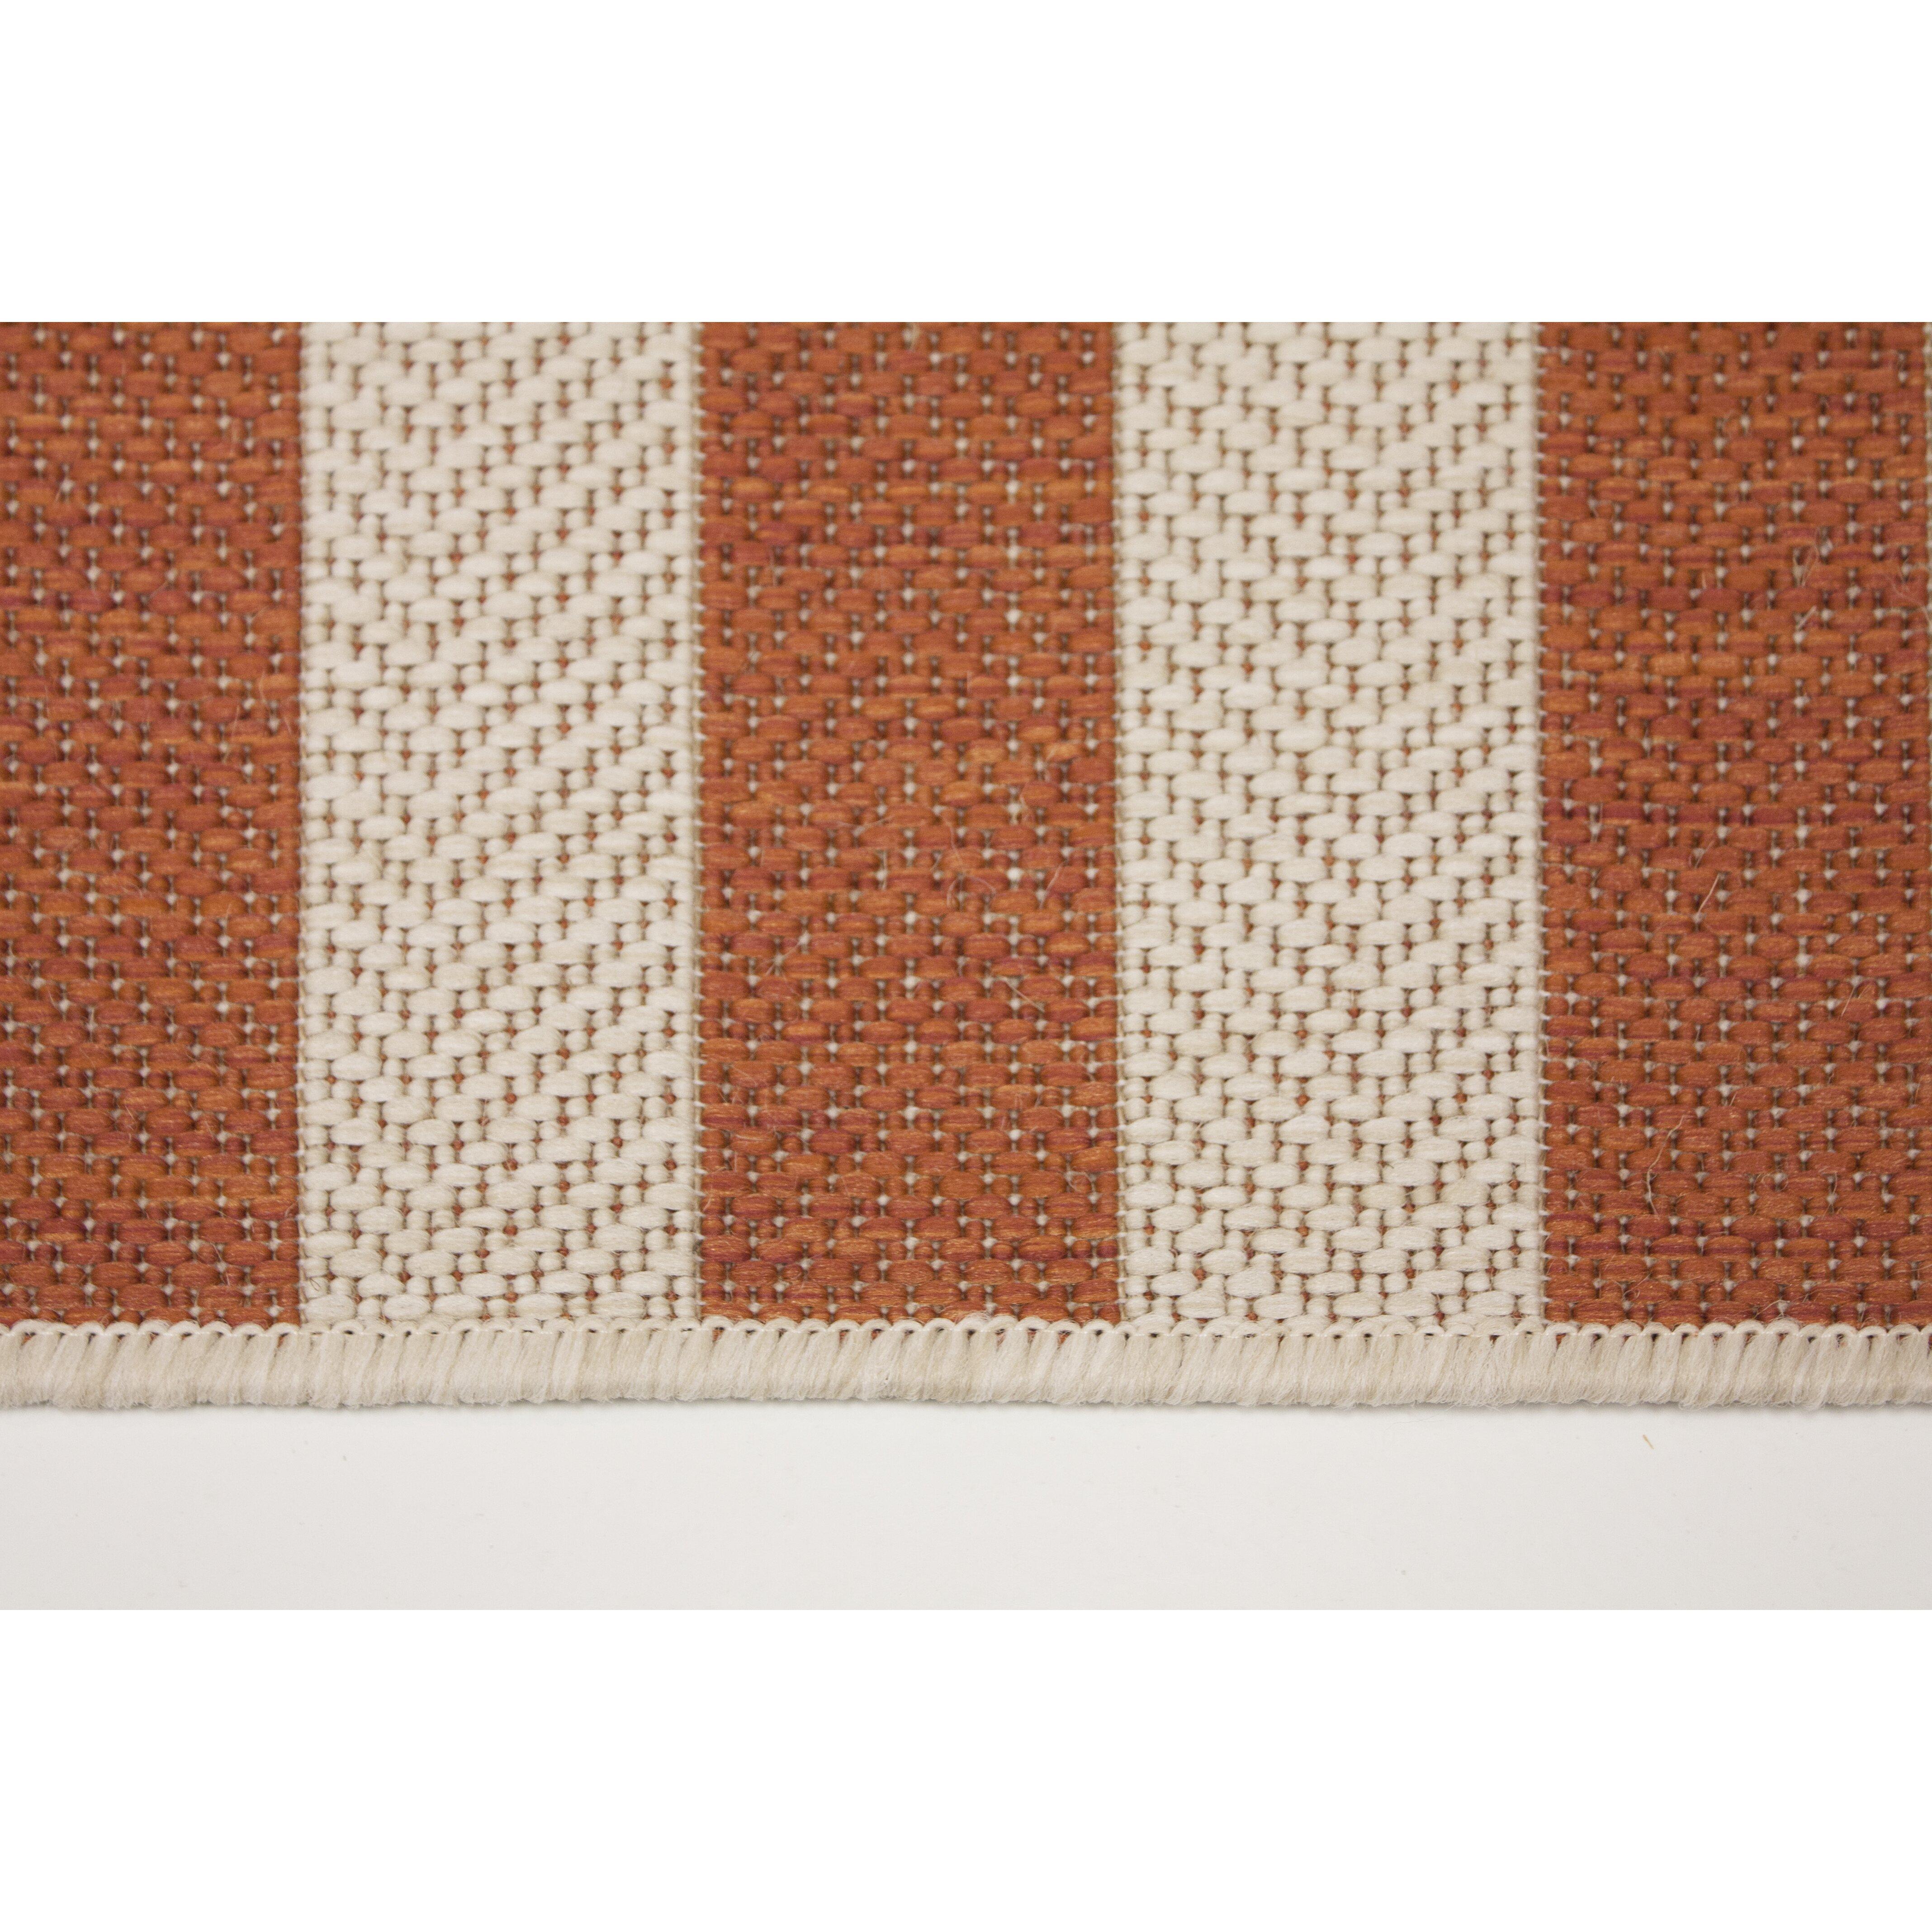 Kalora Coast Stripes Flatweave Cream Orange Indoor Outdoor